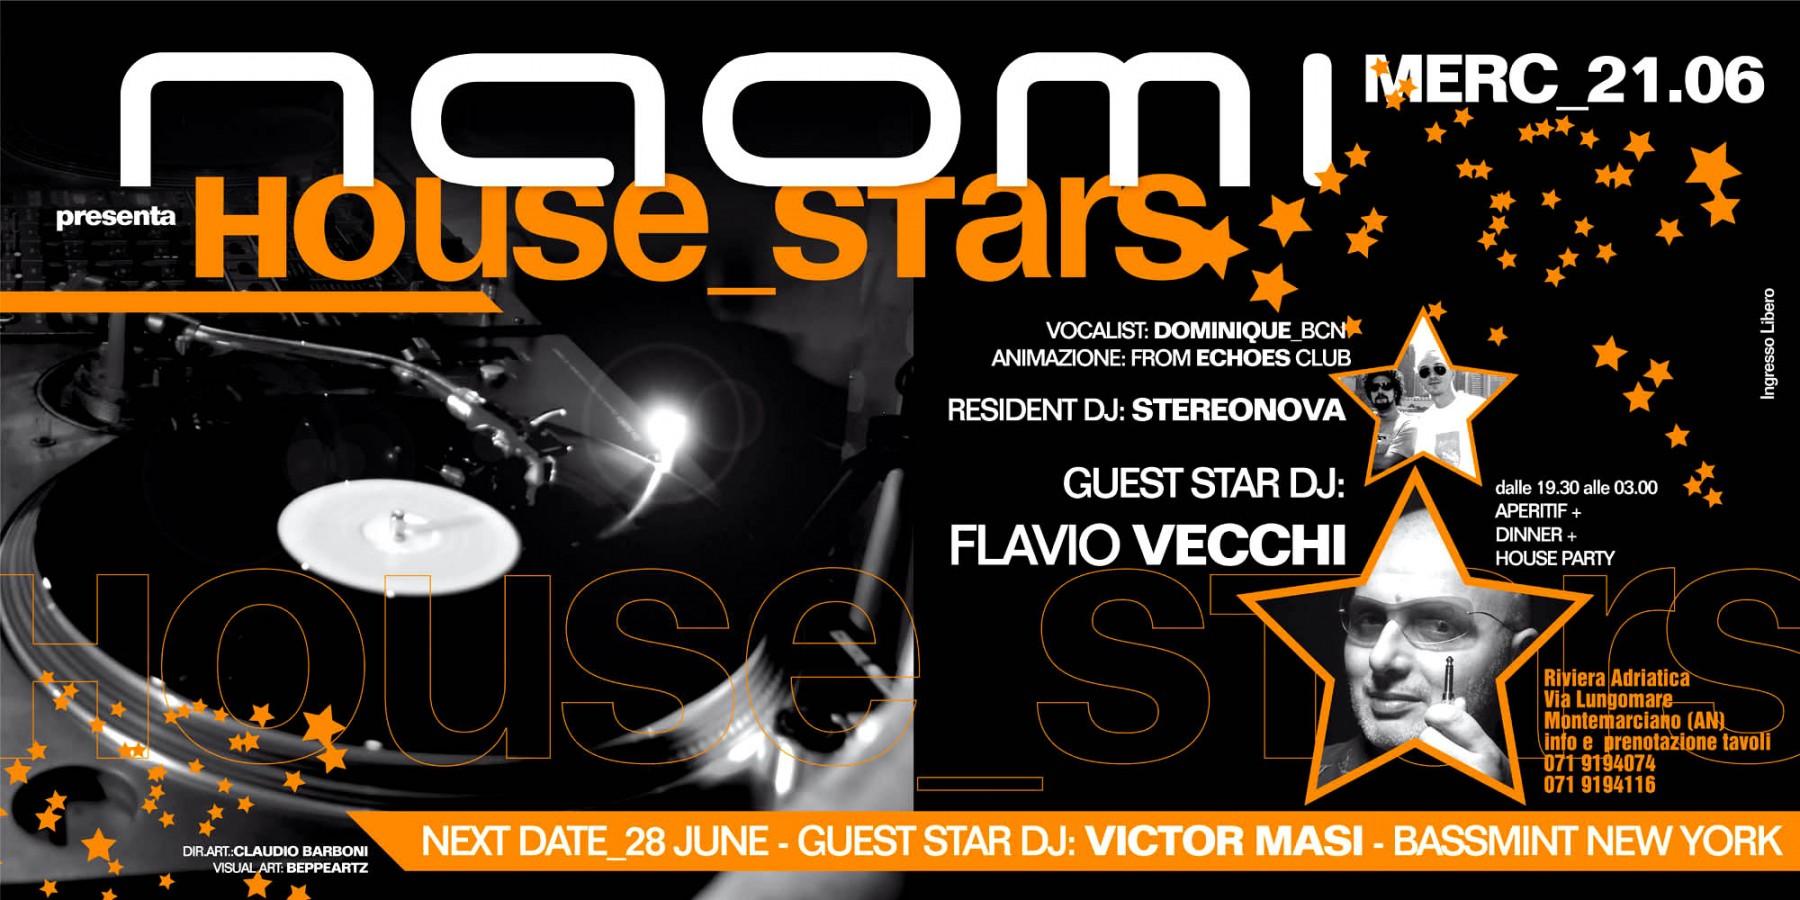 6x3-House-Stars